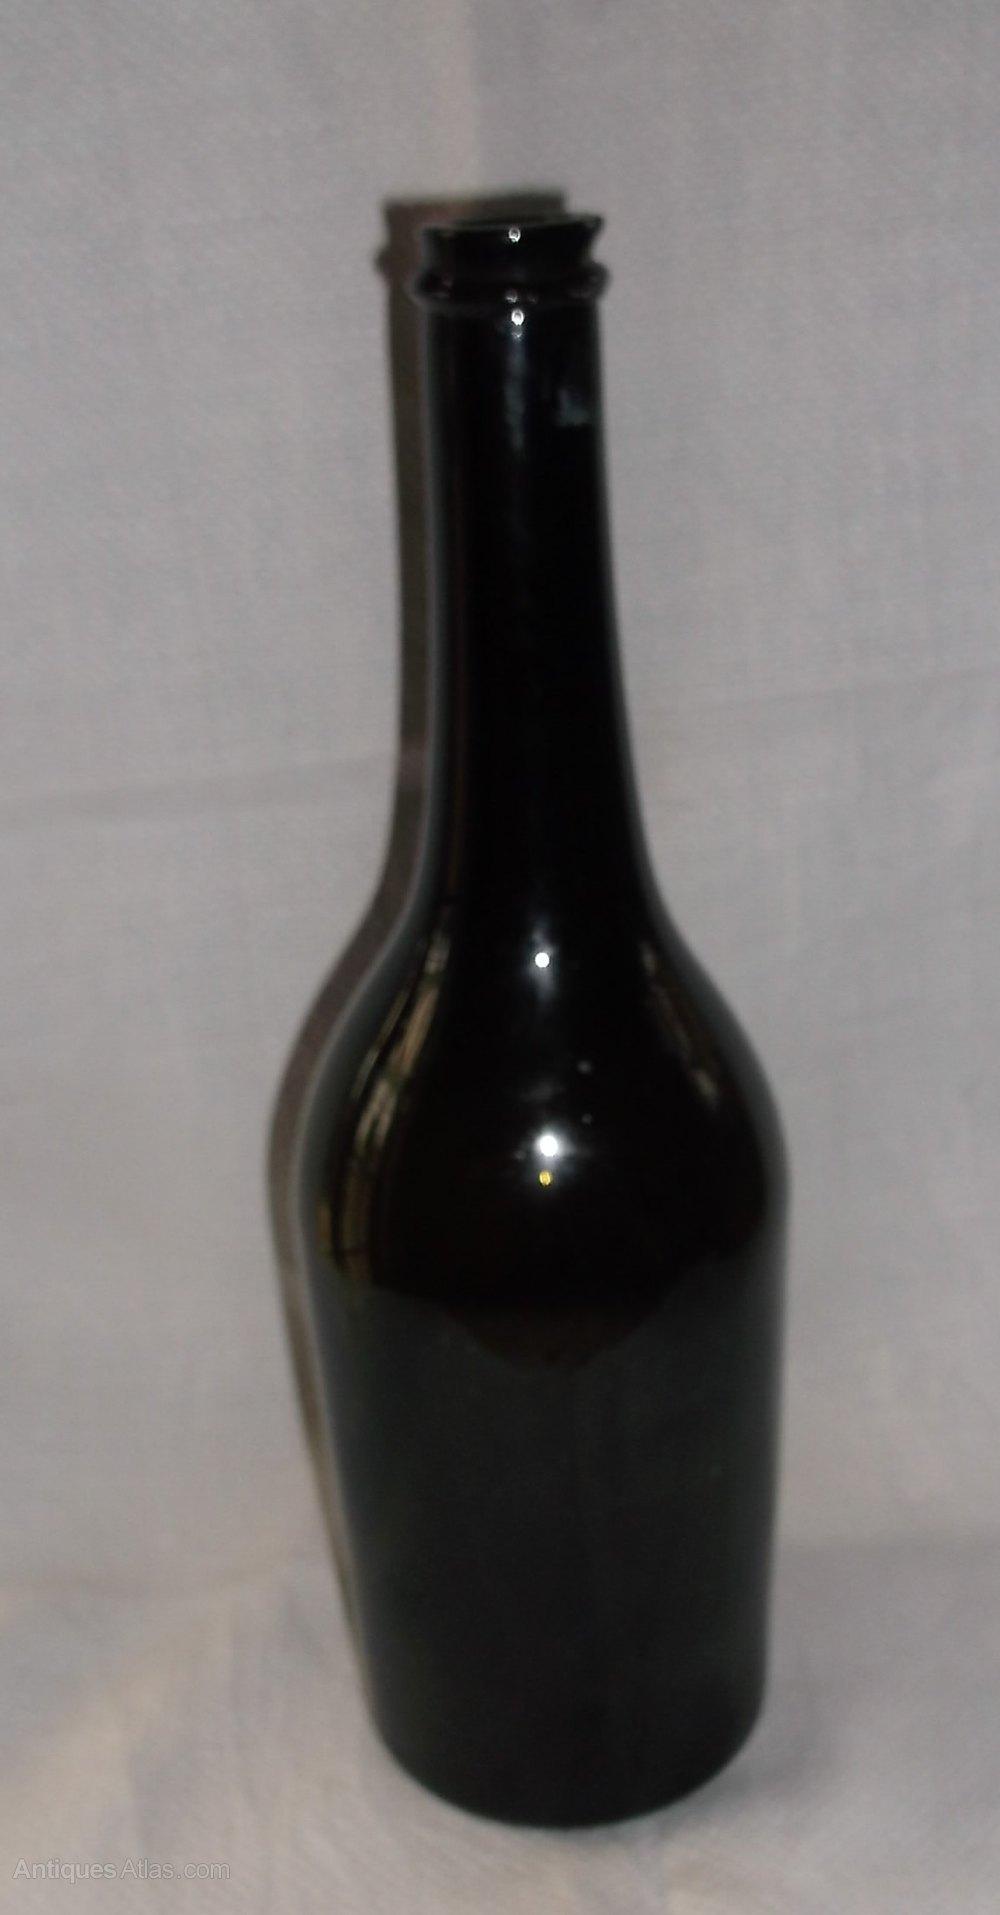 Antiques atlas 19th century green glass wine bottle for Green glass wine bottles